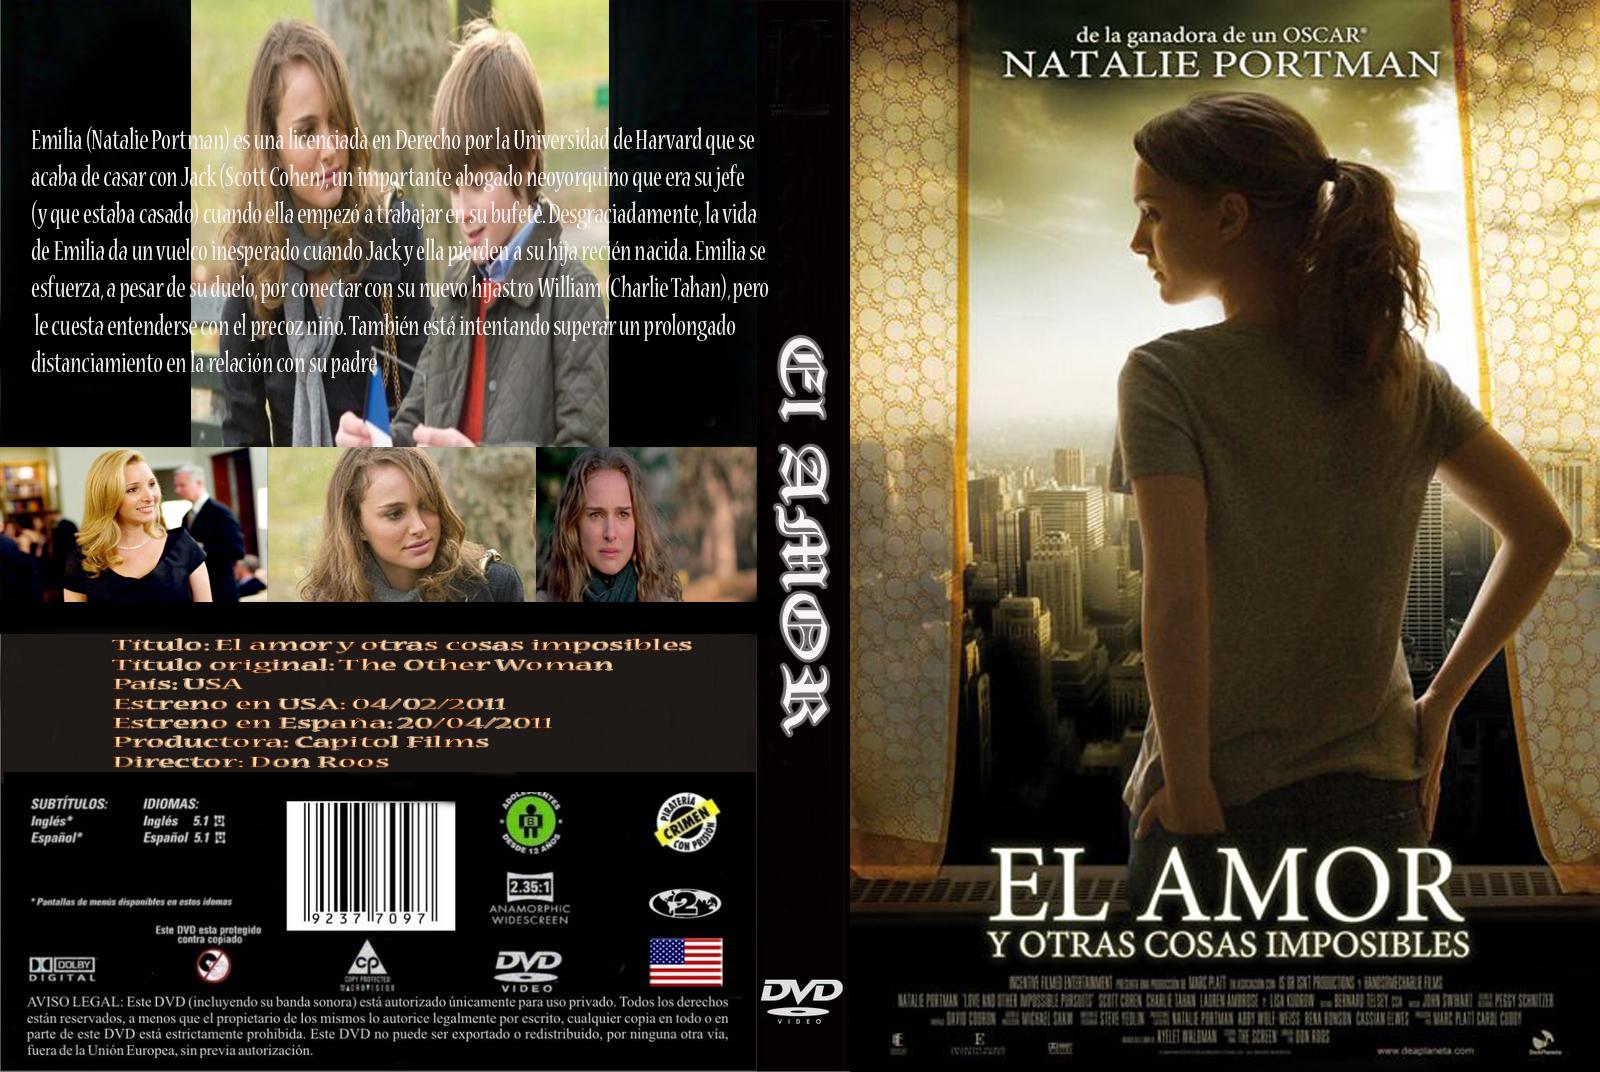 http://4.bp.blogspot.com/-qZ7ashtMXog/TbxqDOsUFXI/AAAAAAAAACI/cu4UrQB9bww/s1600/El+Amor+y+Otras+Cosas.png